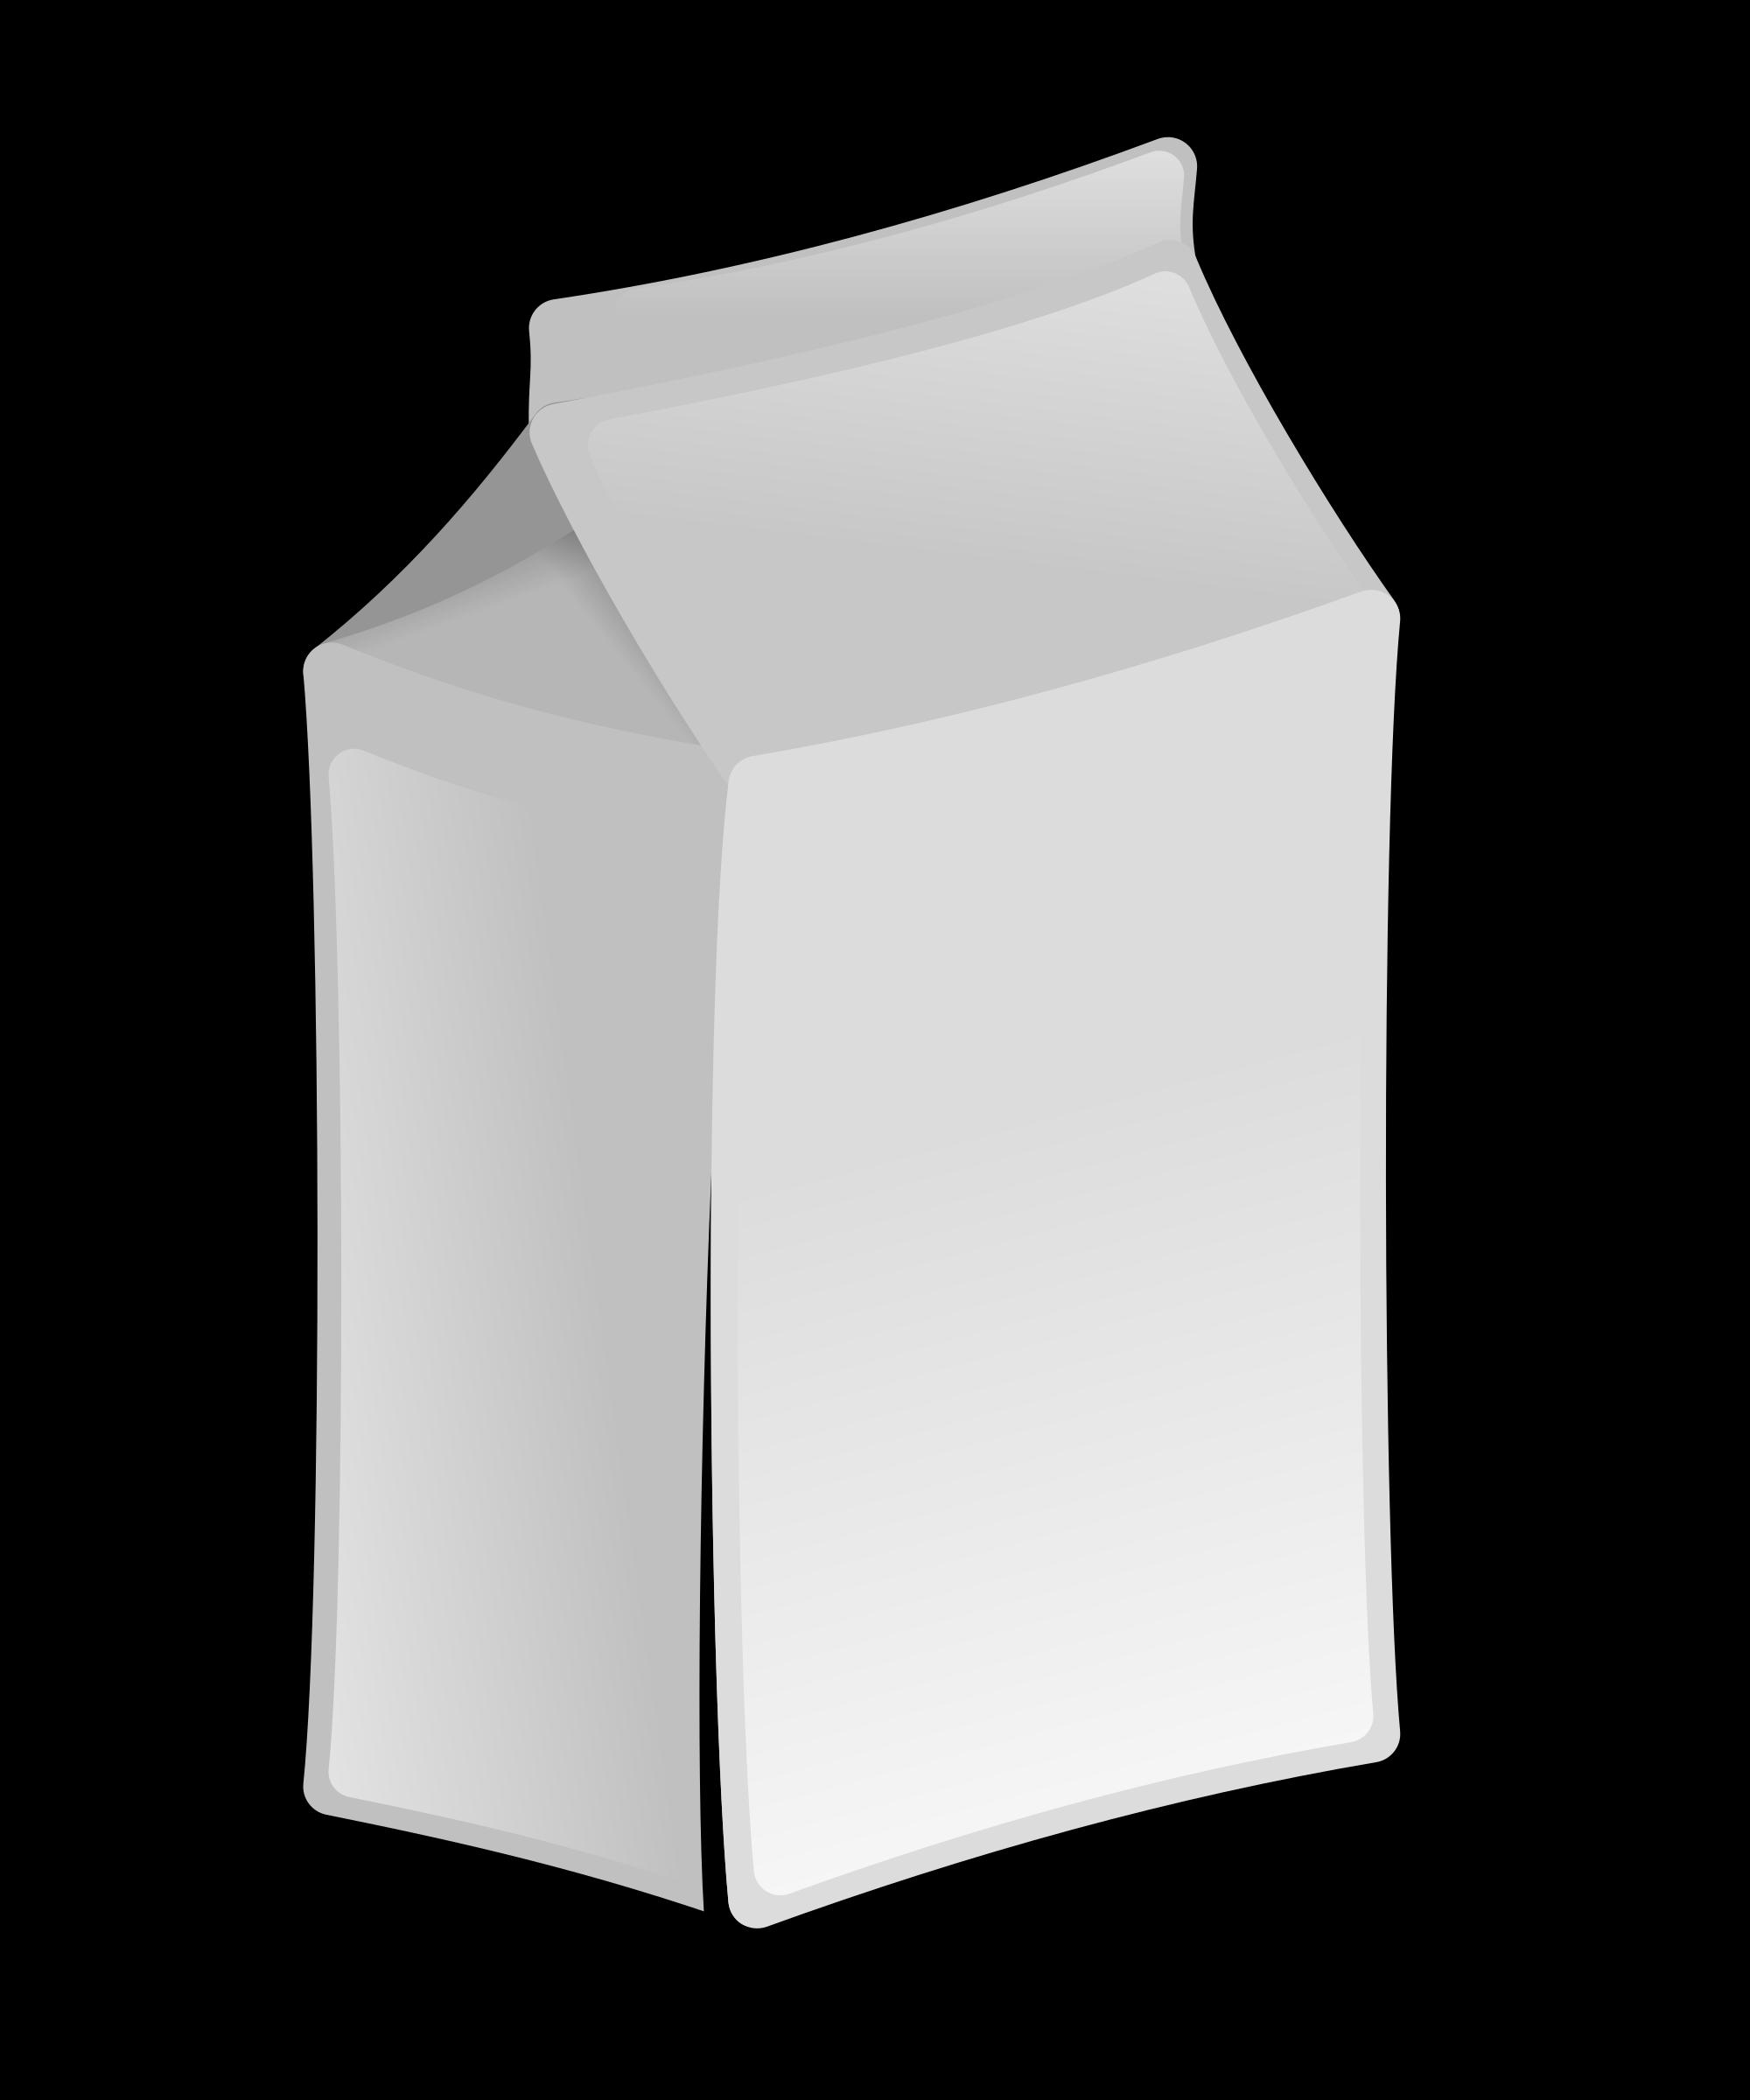 2000x2400 Missing Milk Carton Template Clipart Job Site Analysis Template